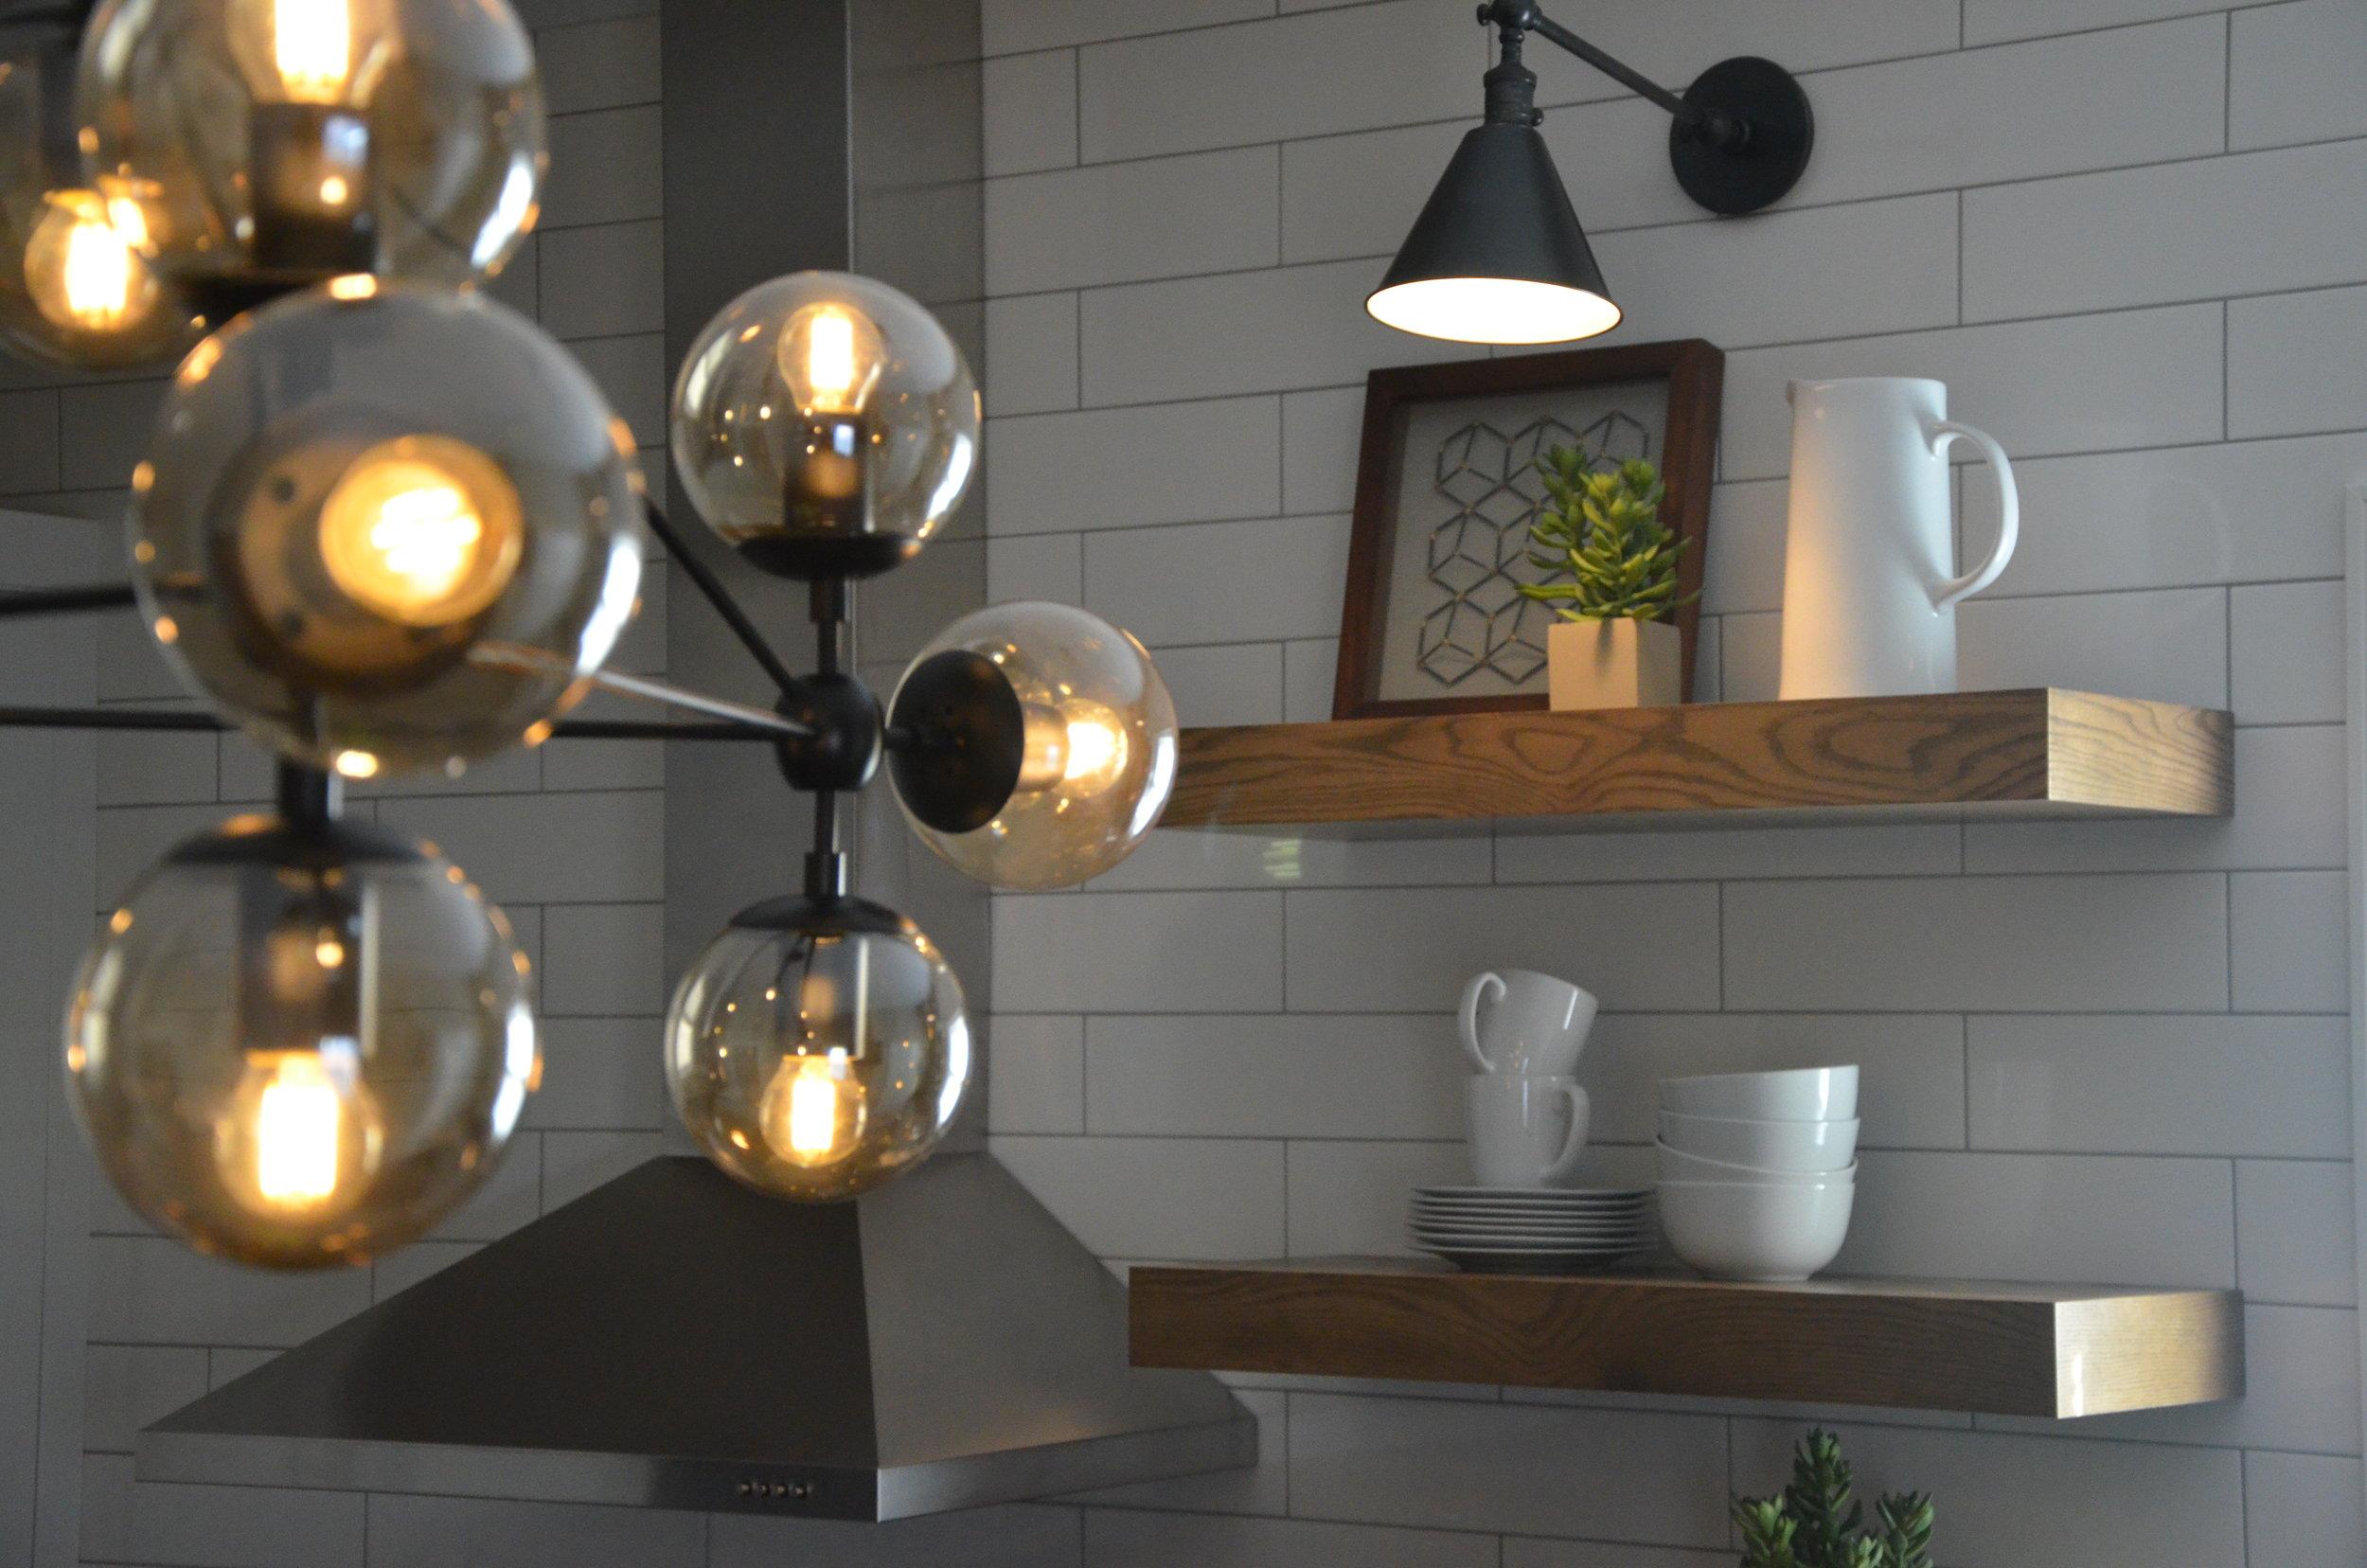 residential kitchen design lexington ky